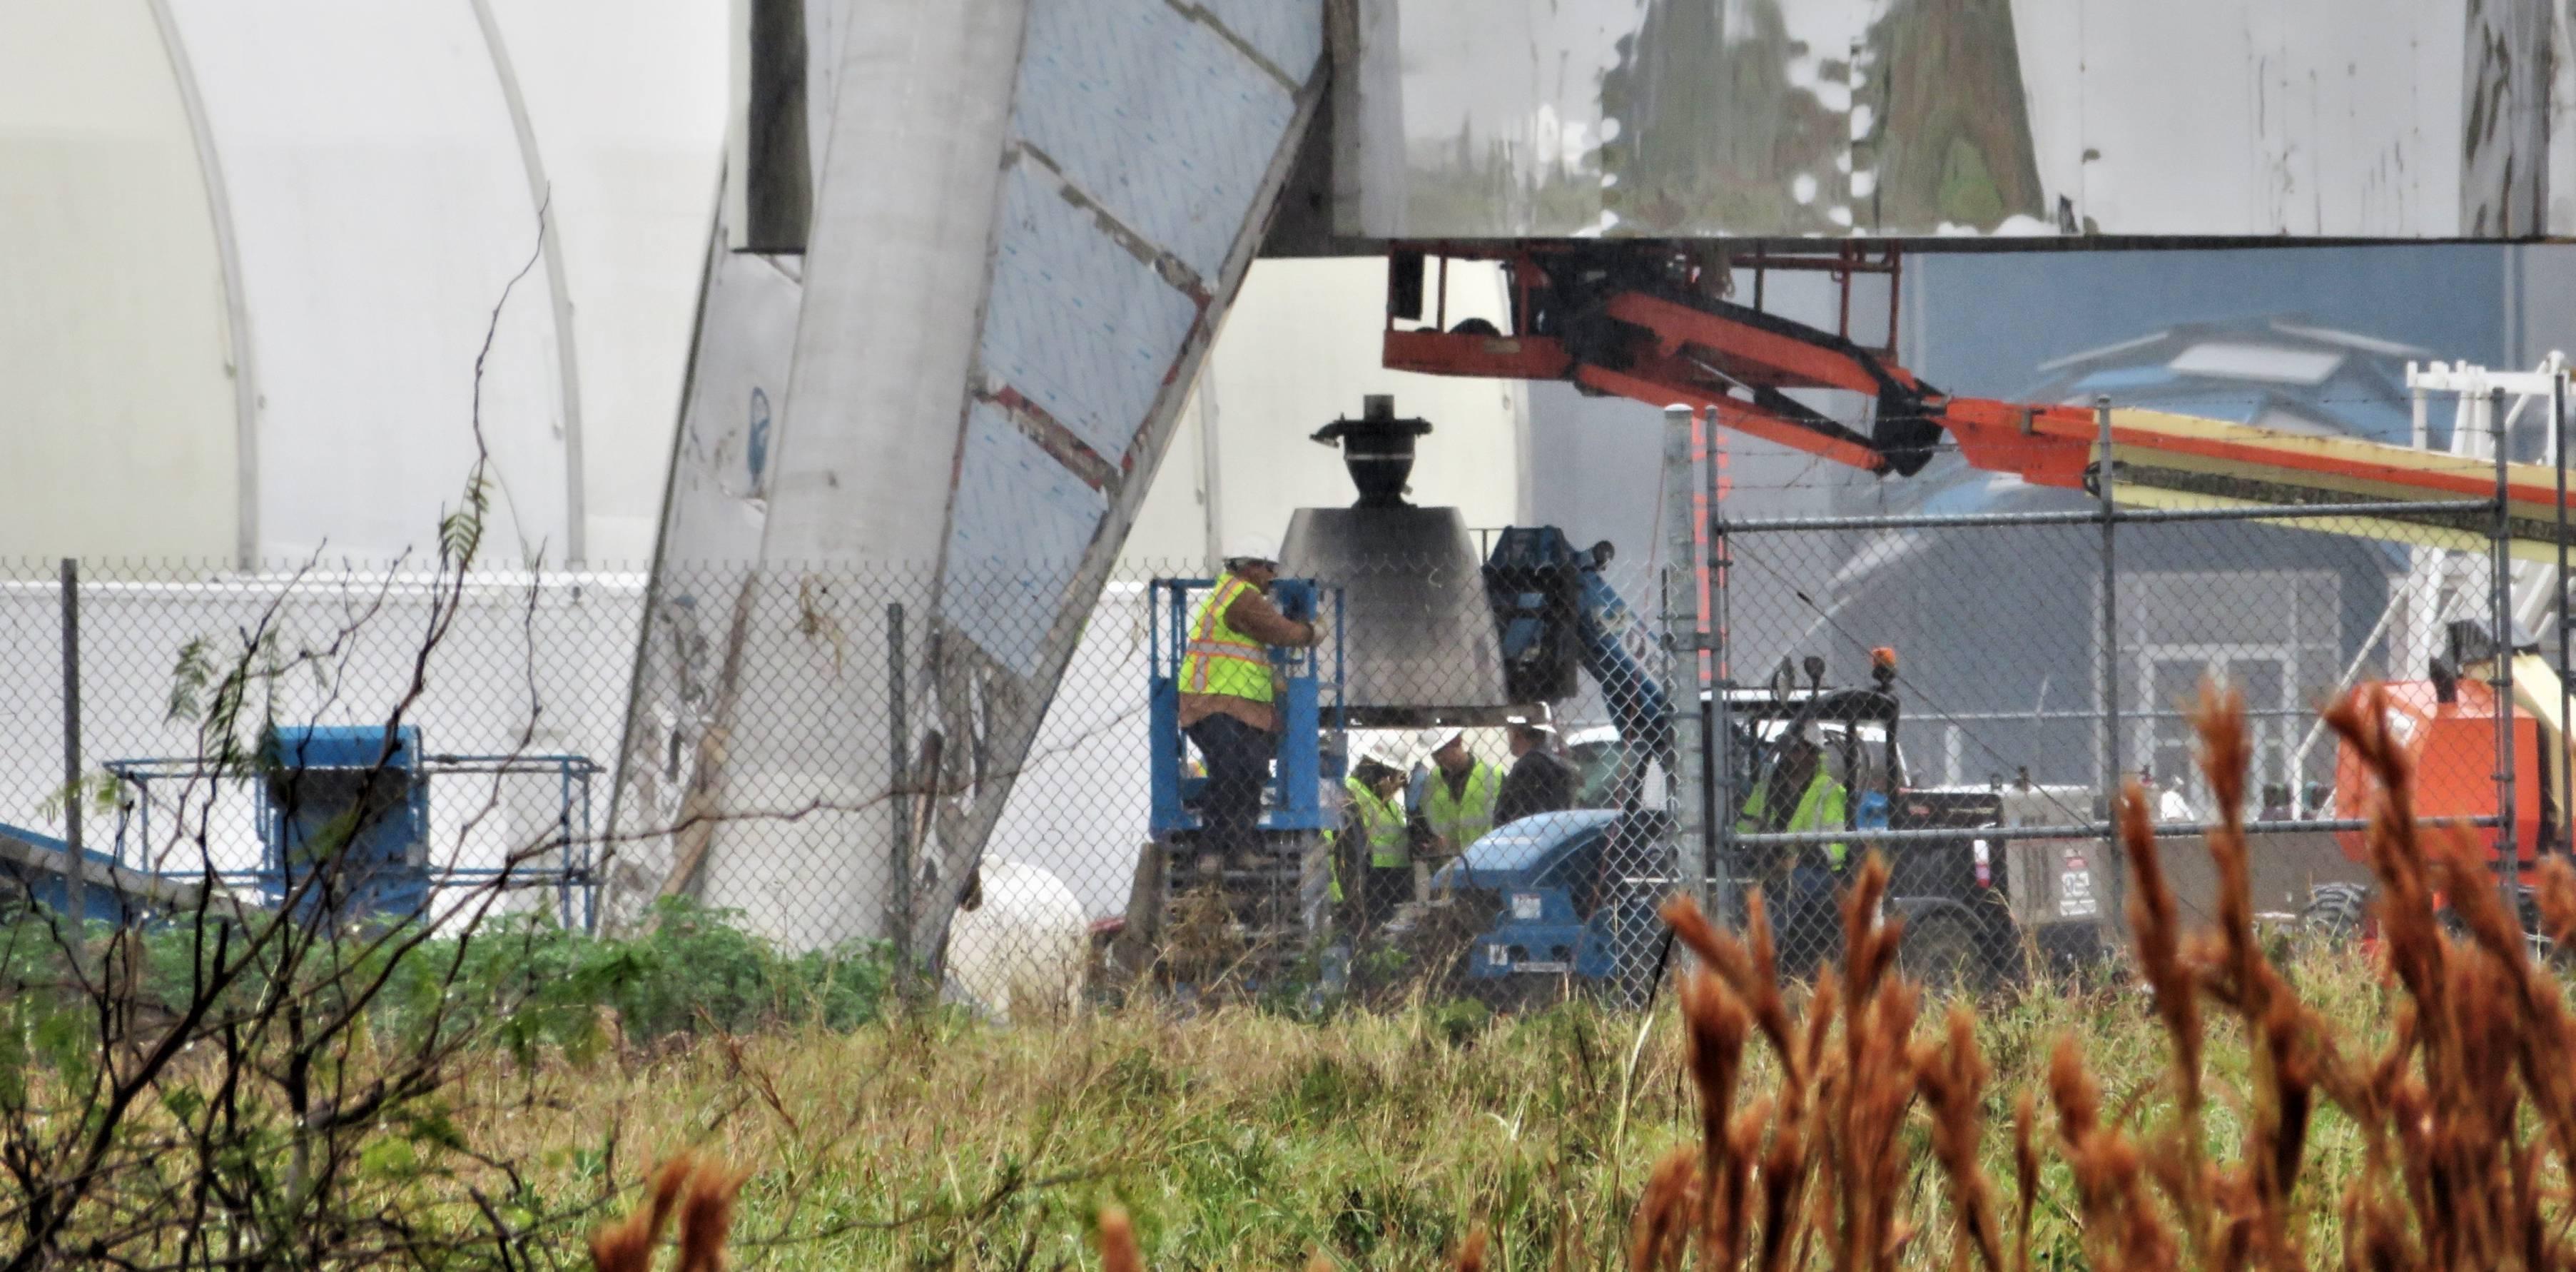 Boca Chica Starship Raptor removal 011519 (NSF – bocachicagal) 4 crop(c)